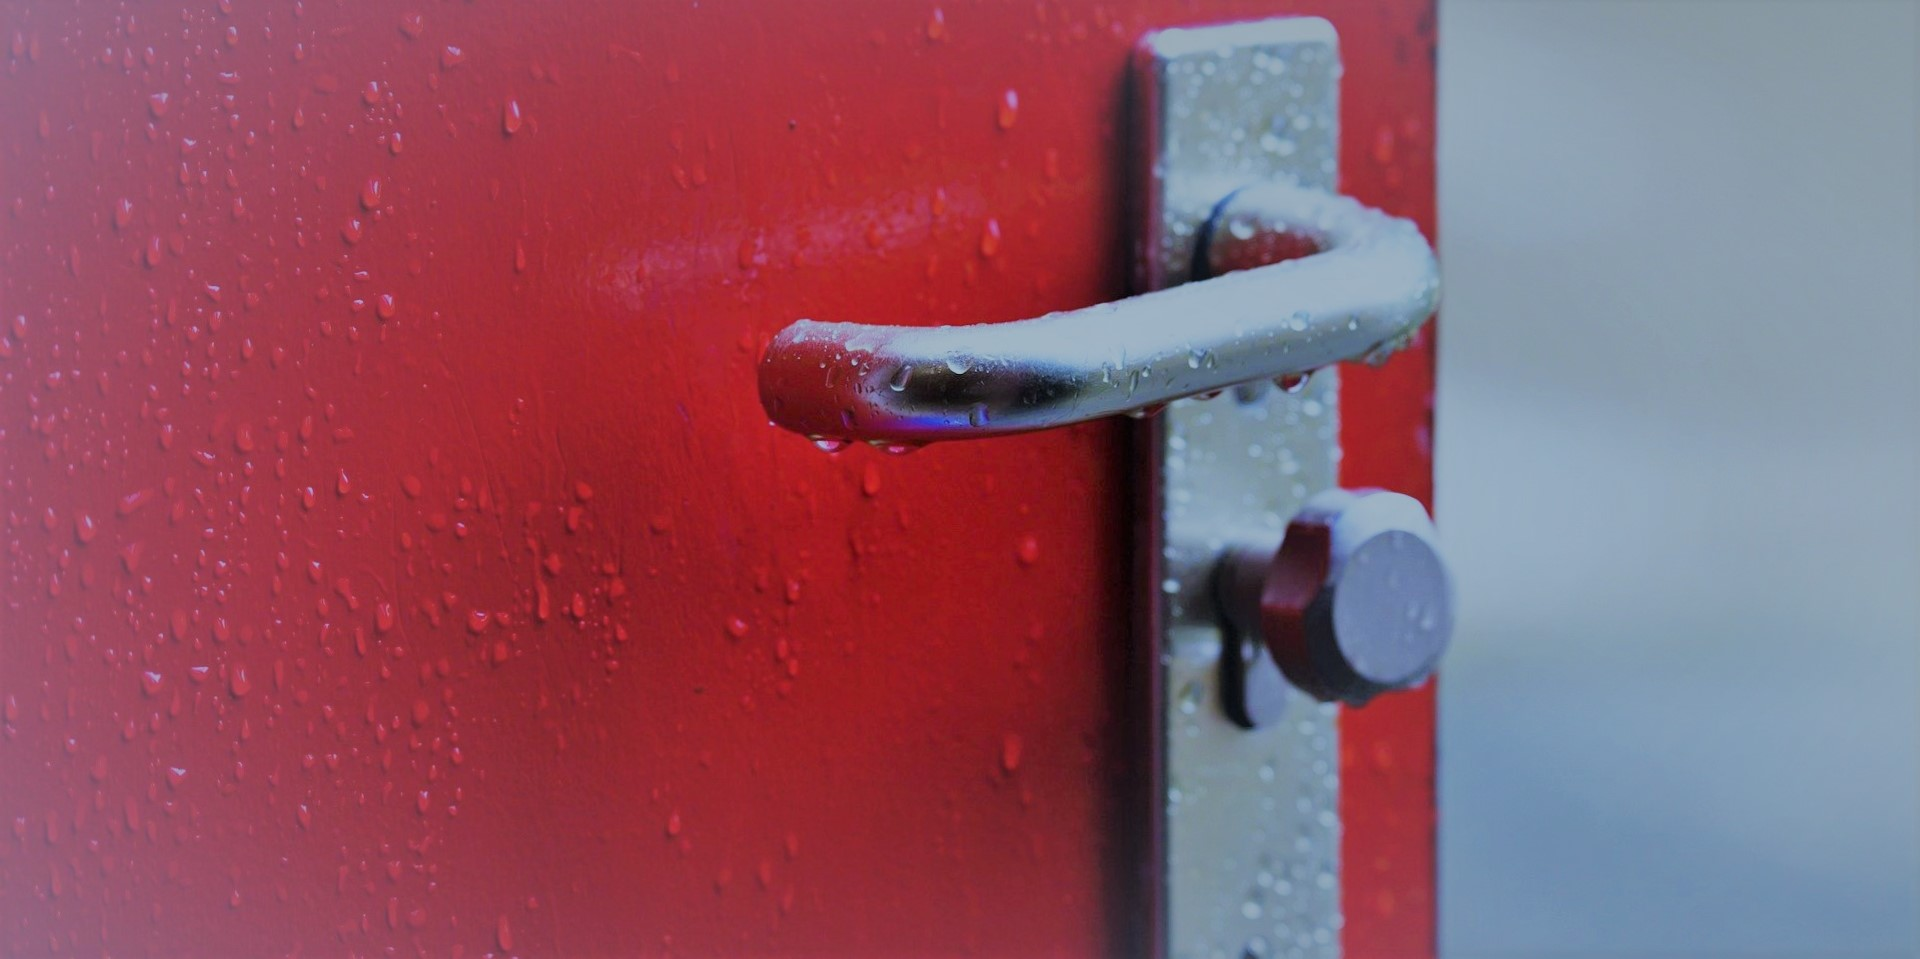 Türschloss mit Magnetkarte